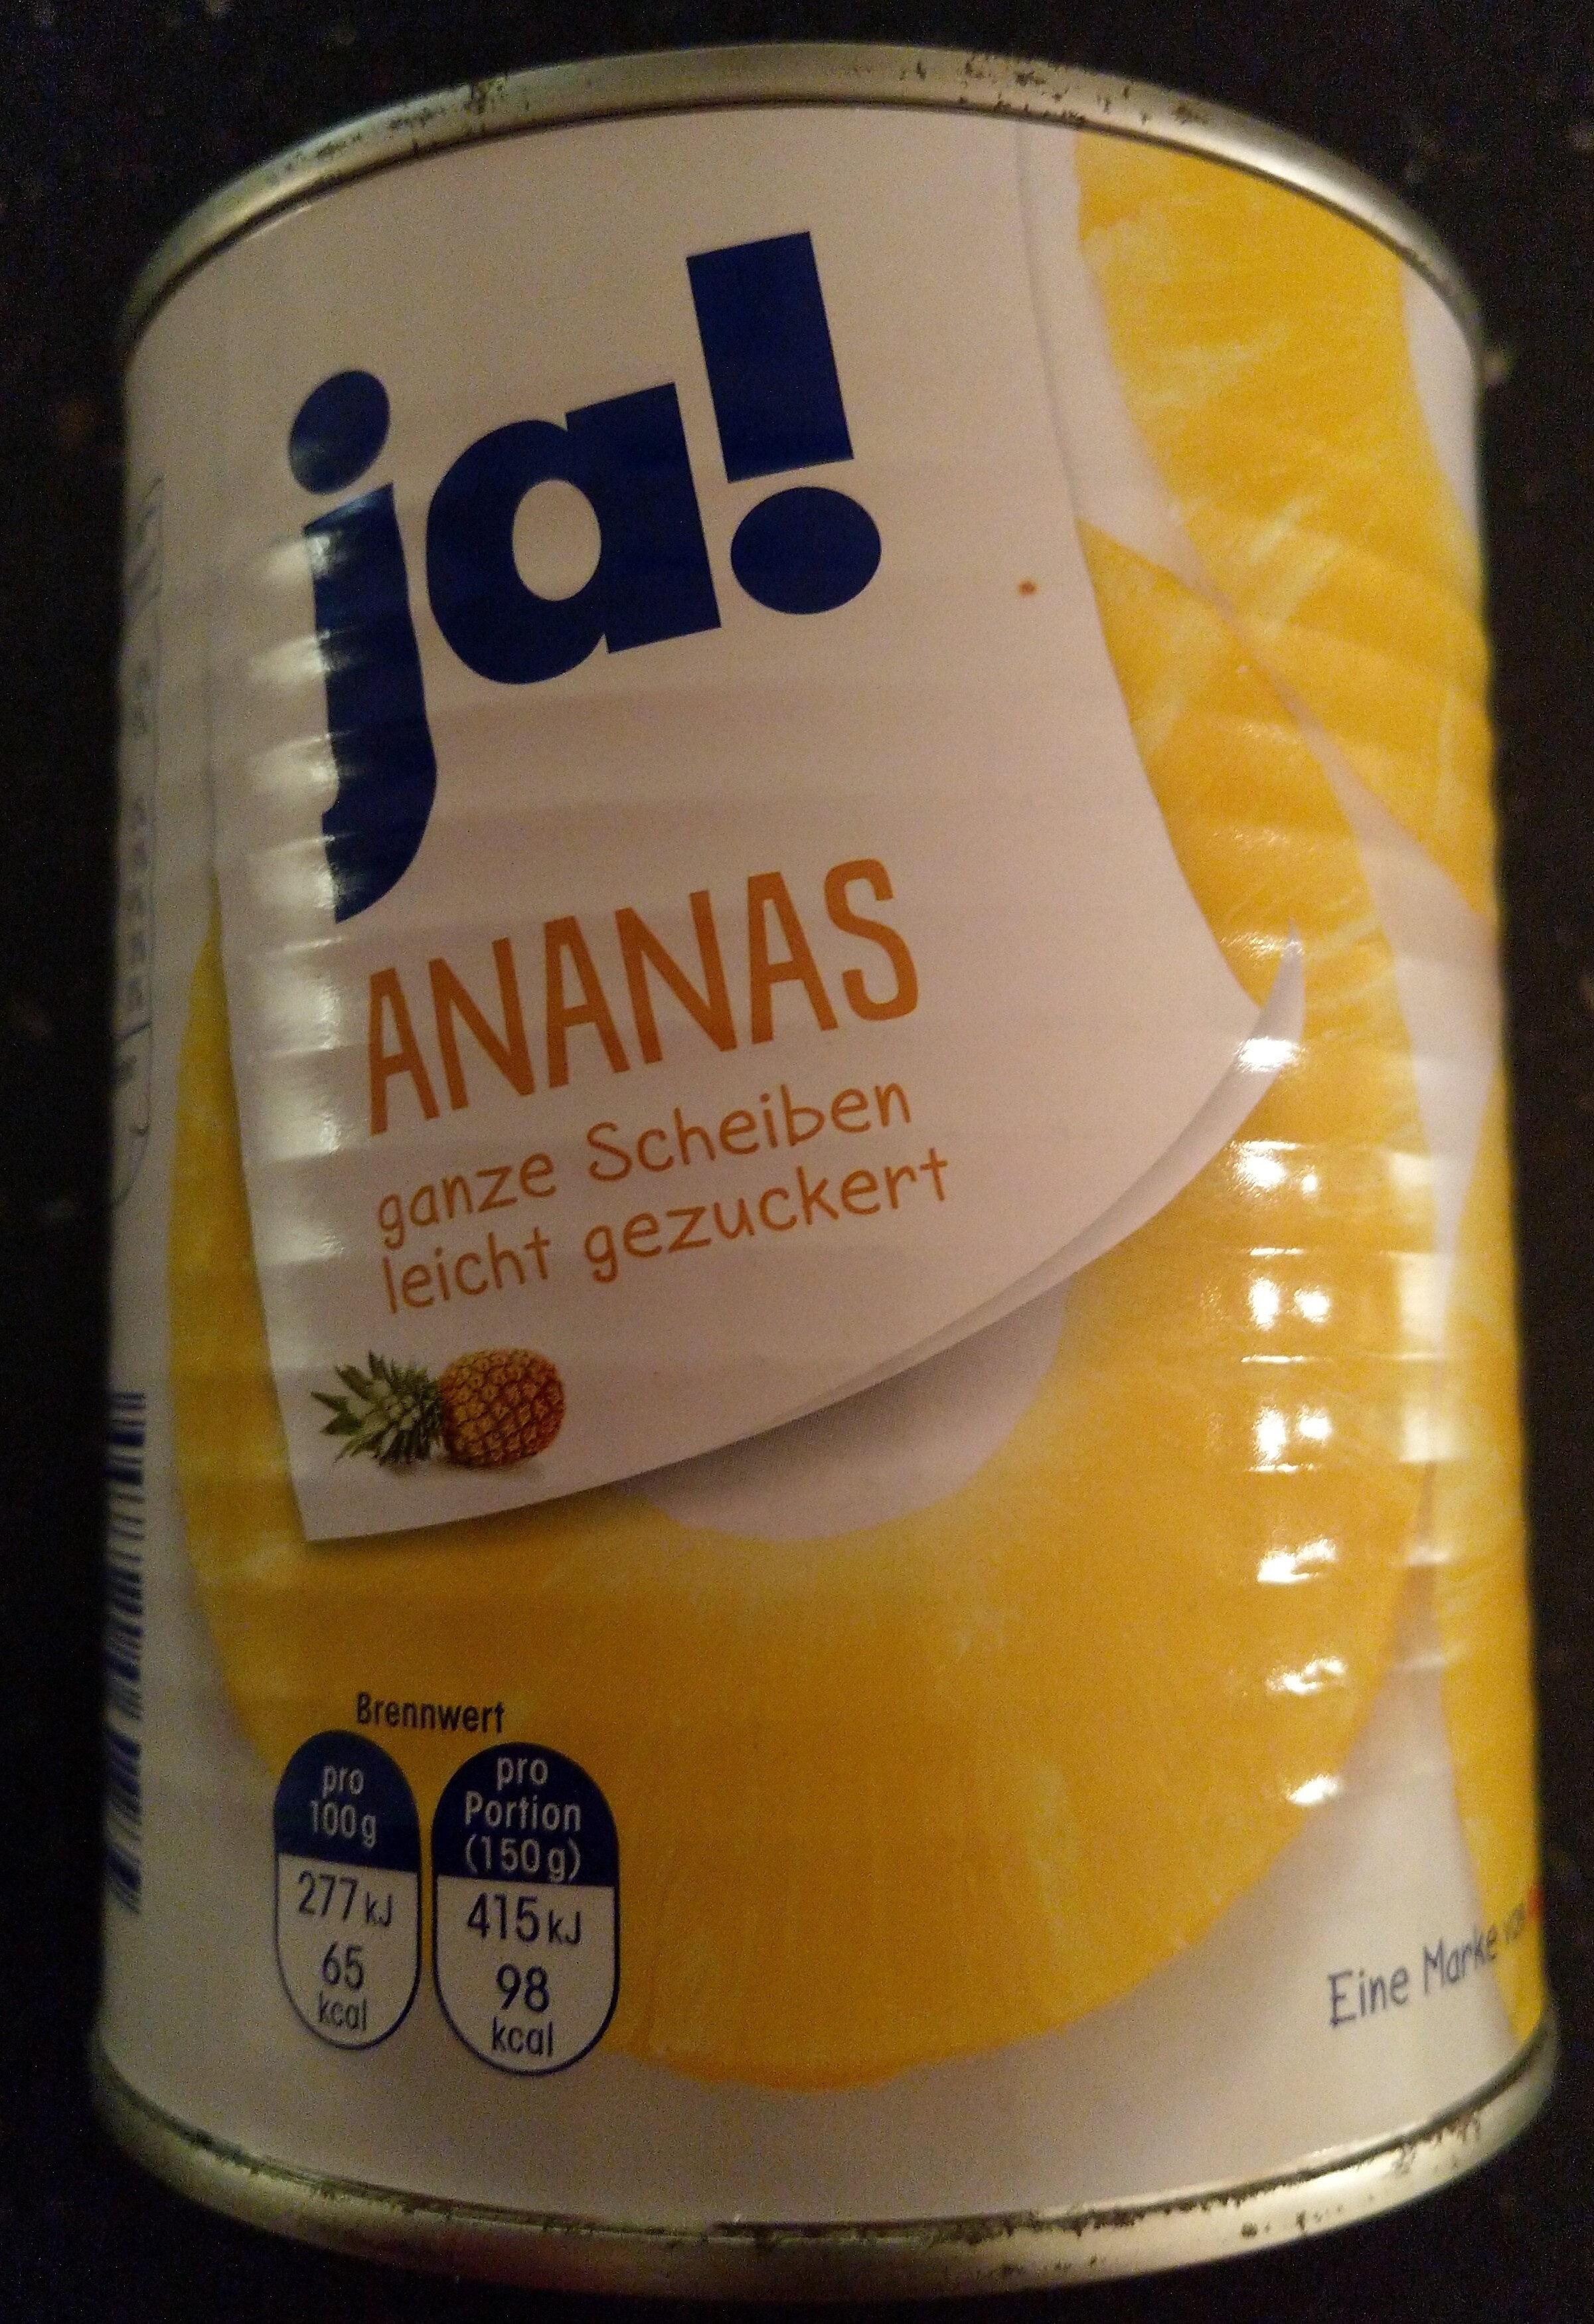 Ananas, ganze Scheiben leicht gezuckert - Produit - de